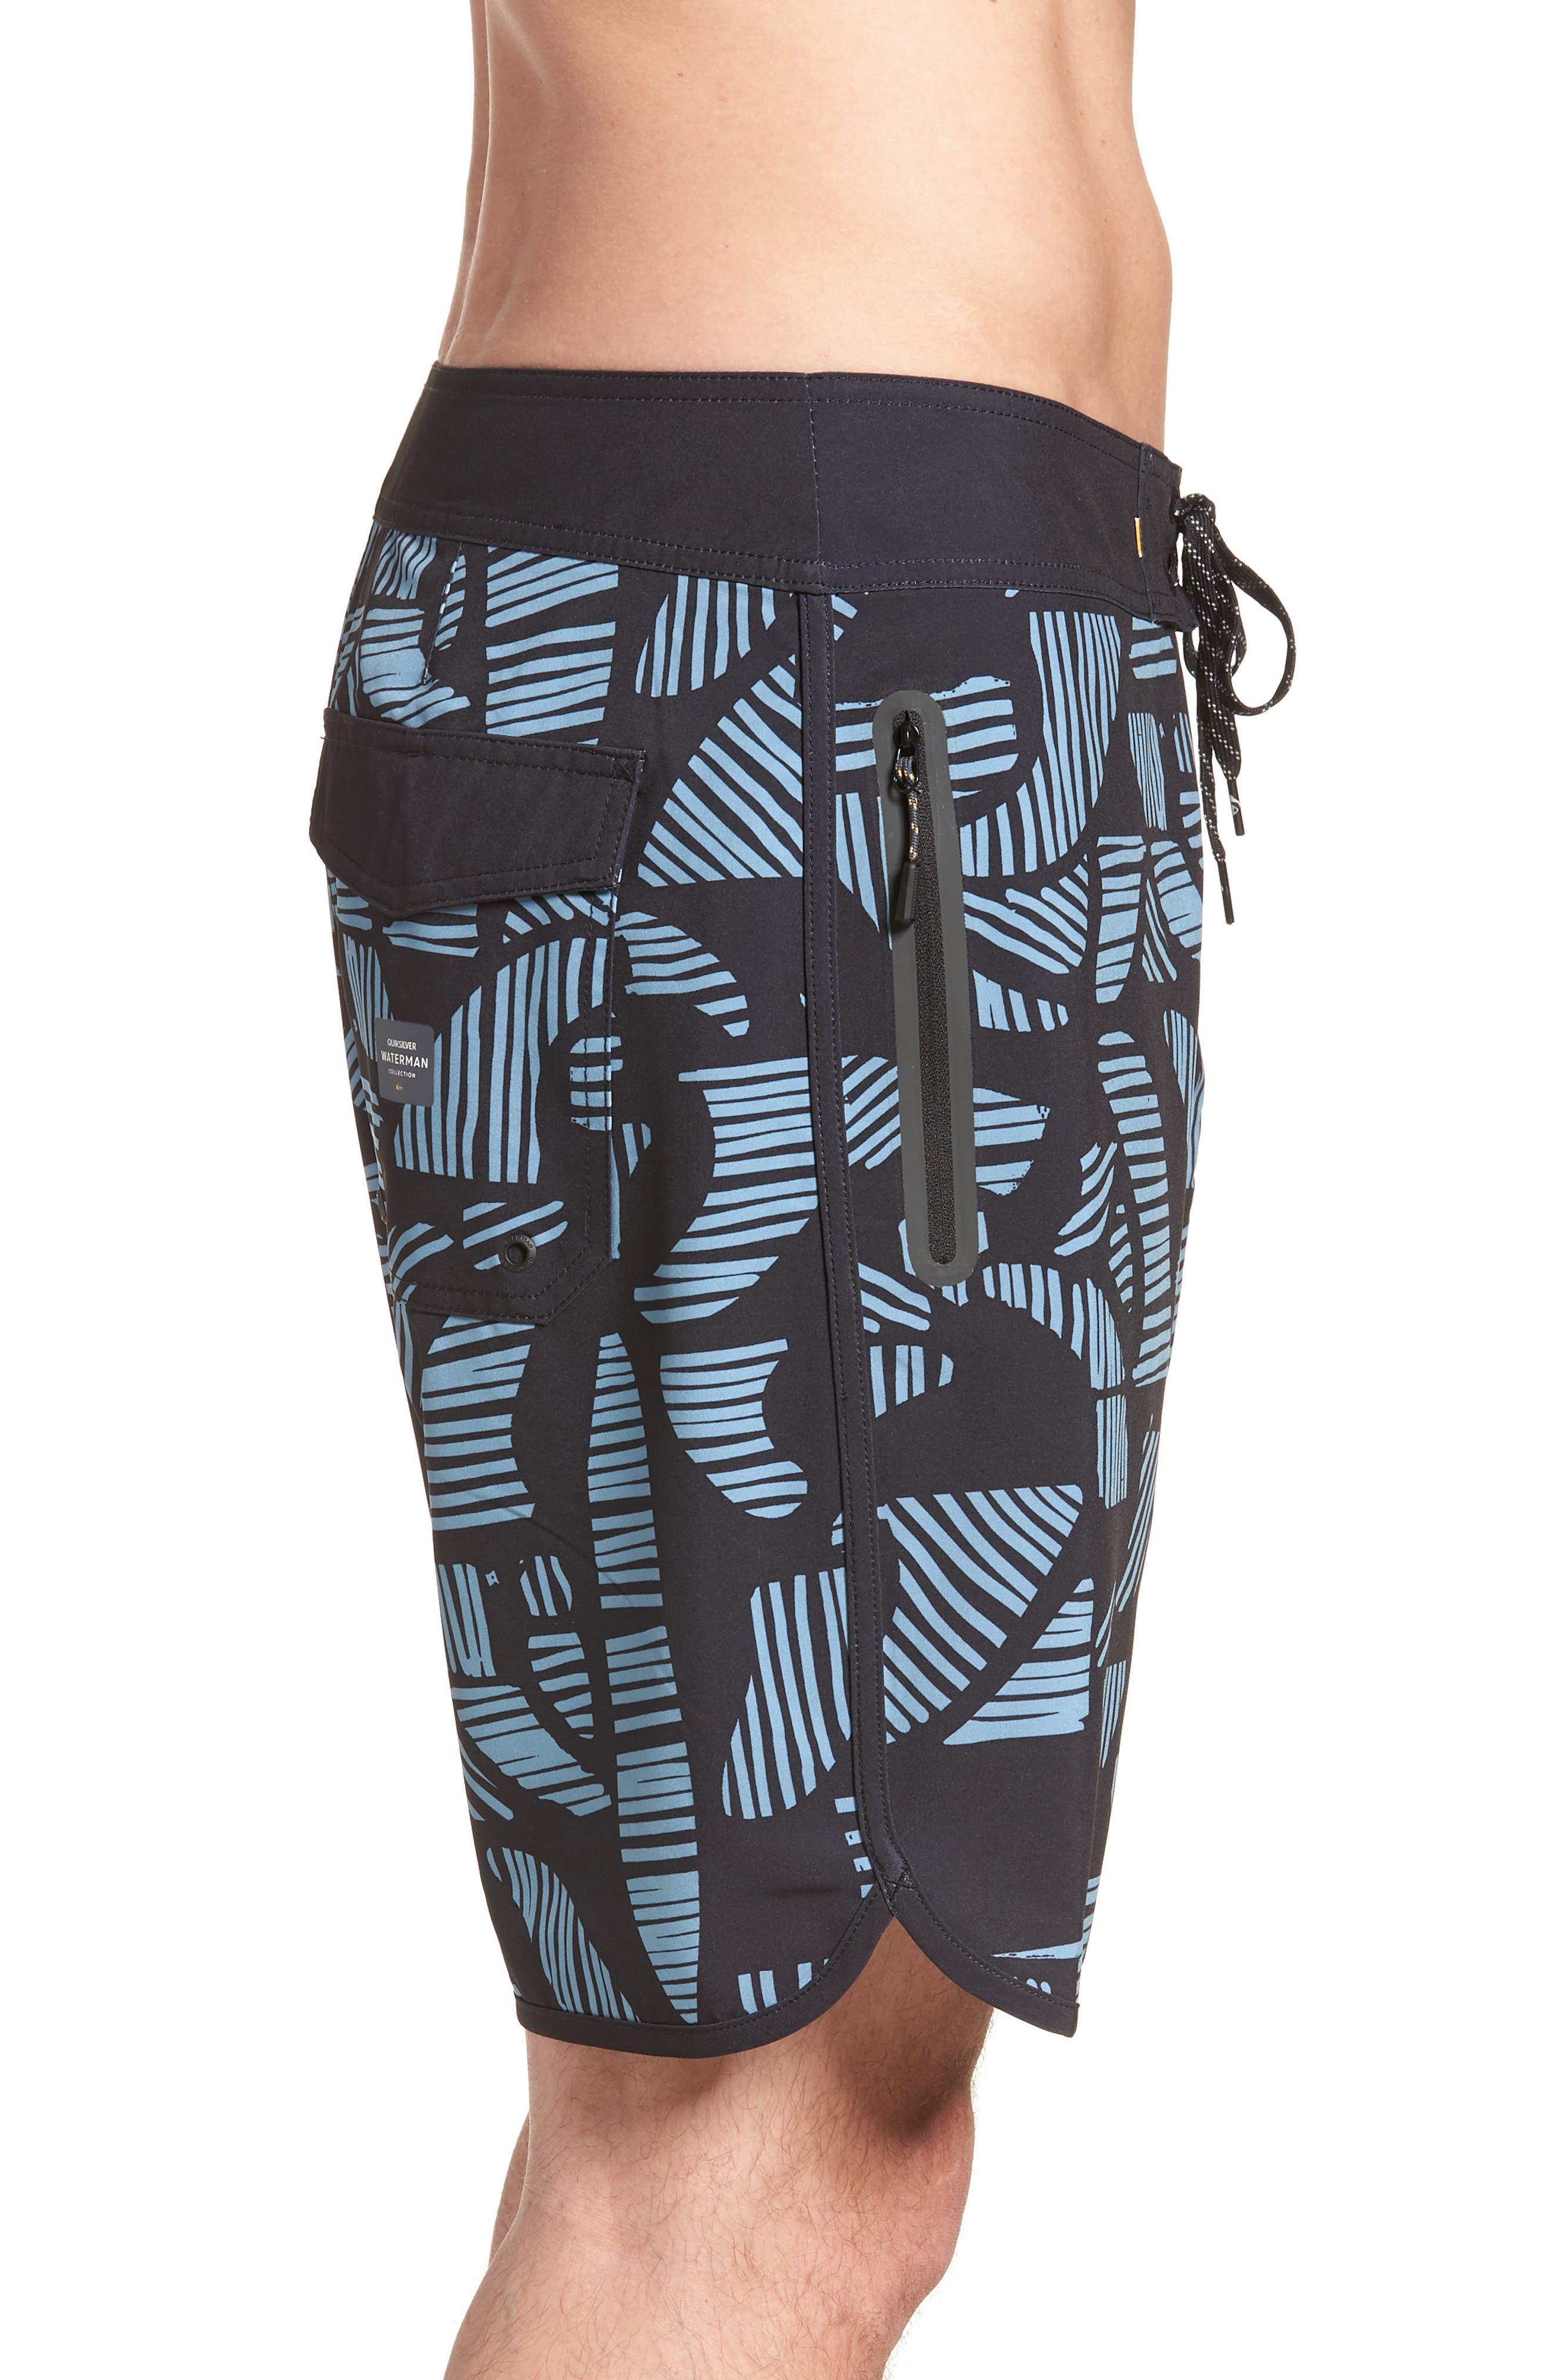 Odysea Board Shorts,                             Alternate thumbnail 3, color,                             002